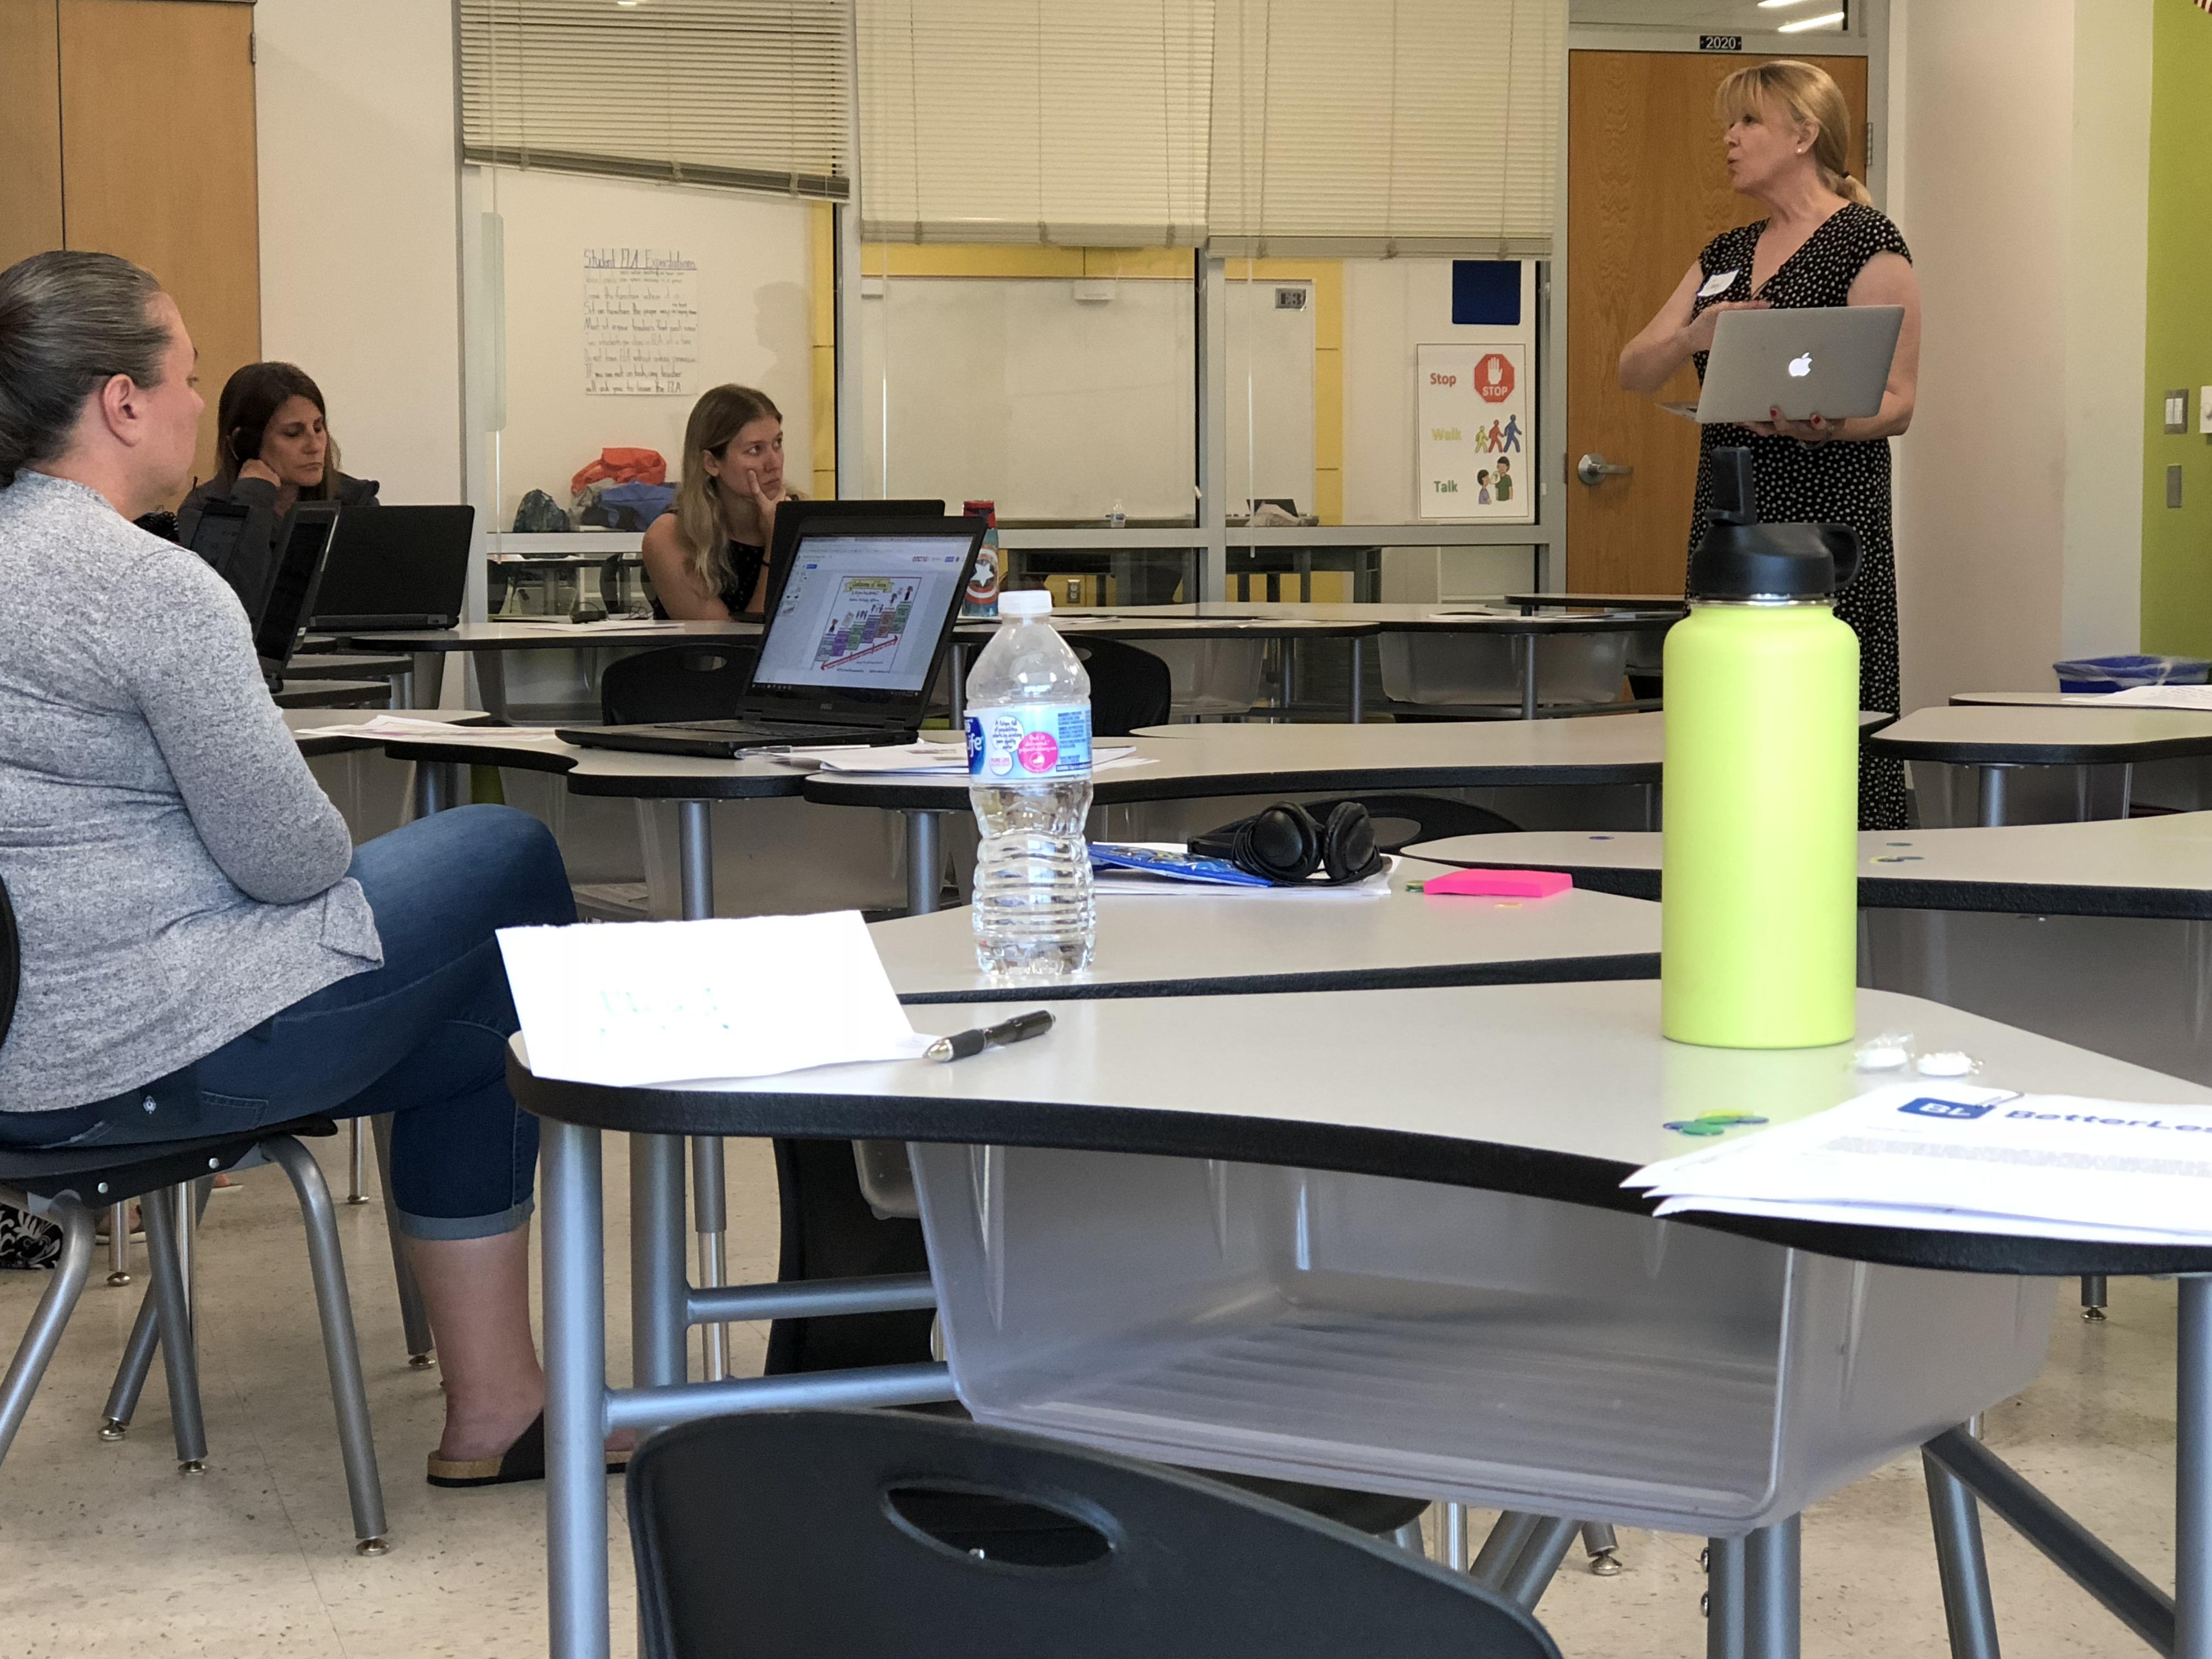 BetterLesson Coach, Cheryl Belknap facilitate a break out session during the Design Studio